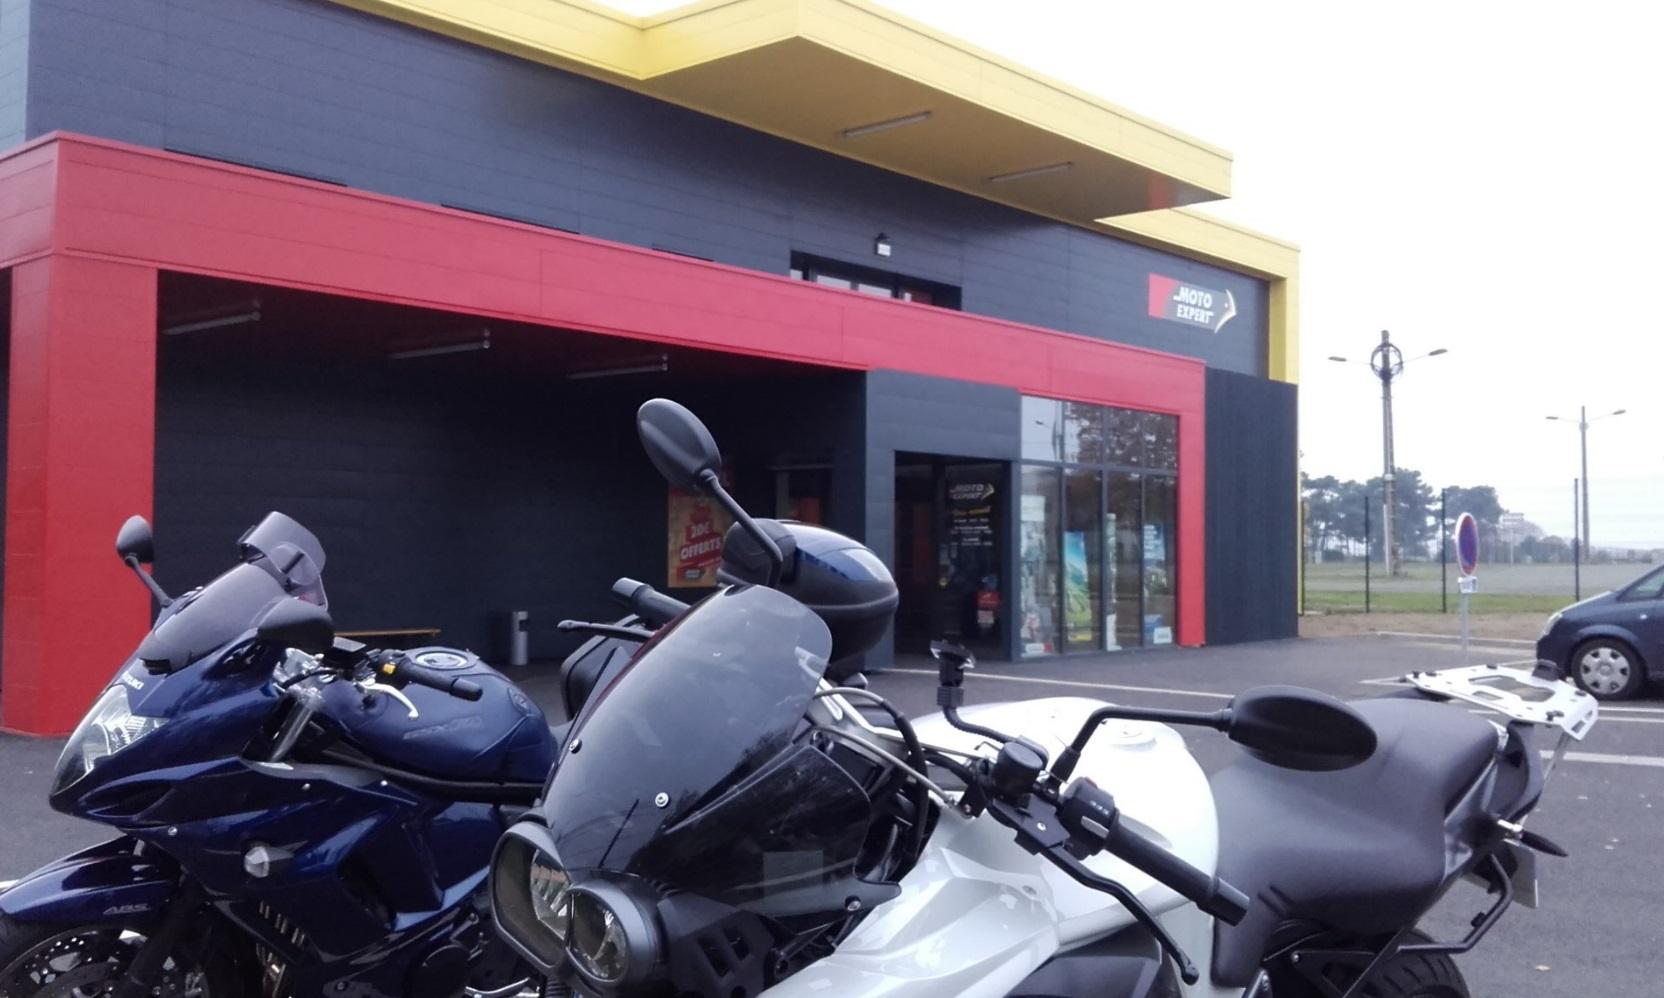 moto expert d m nage et s agrandit auto moto magazine. Black Bedroom Furniture Sets. Home Design Ideas